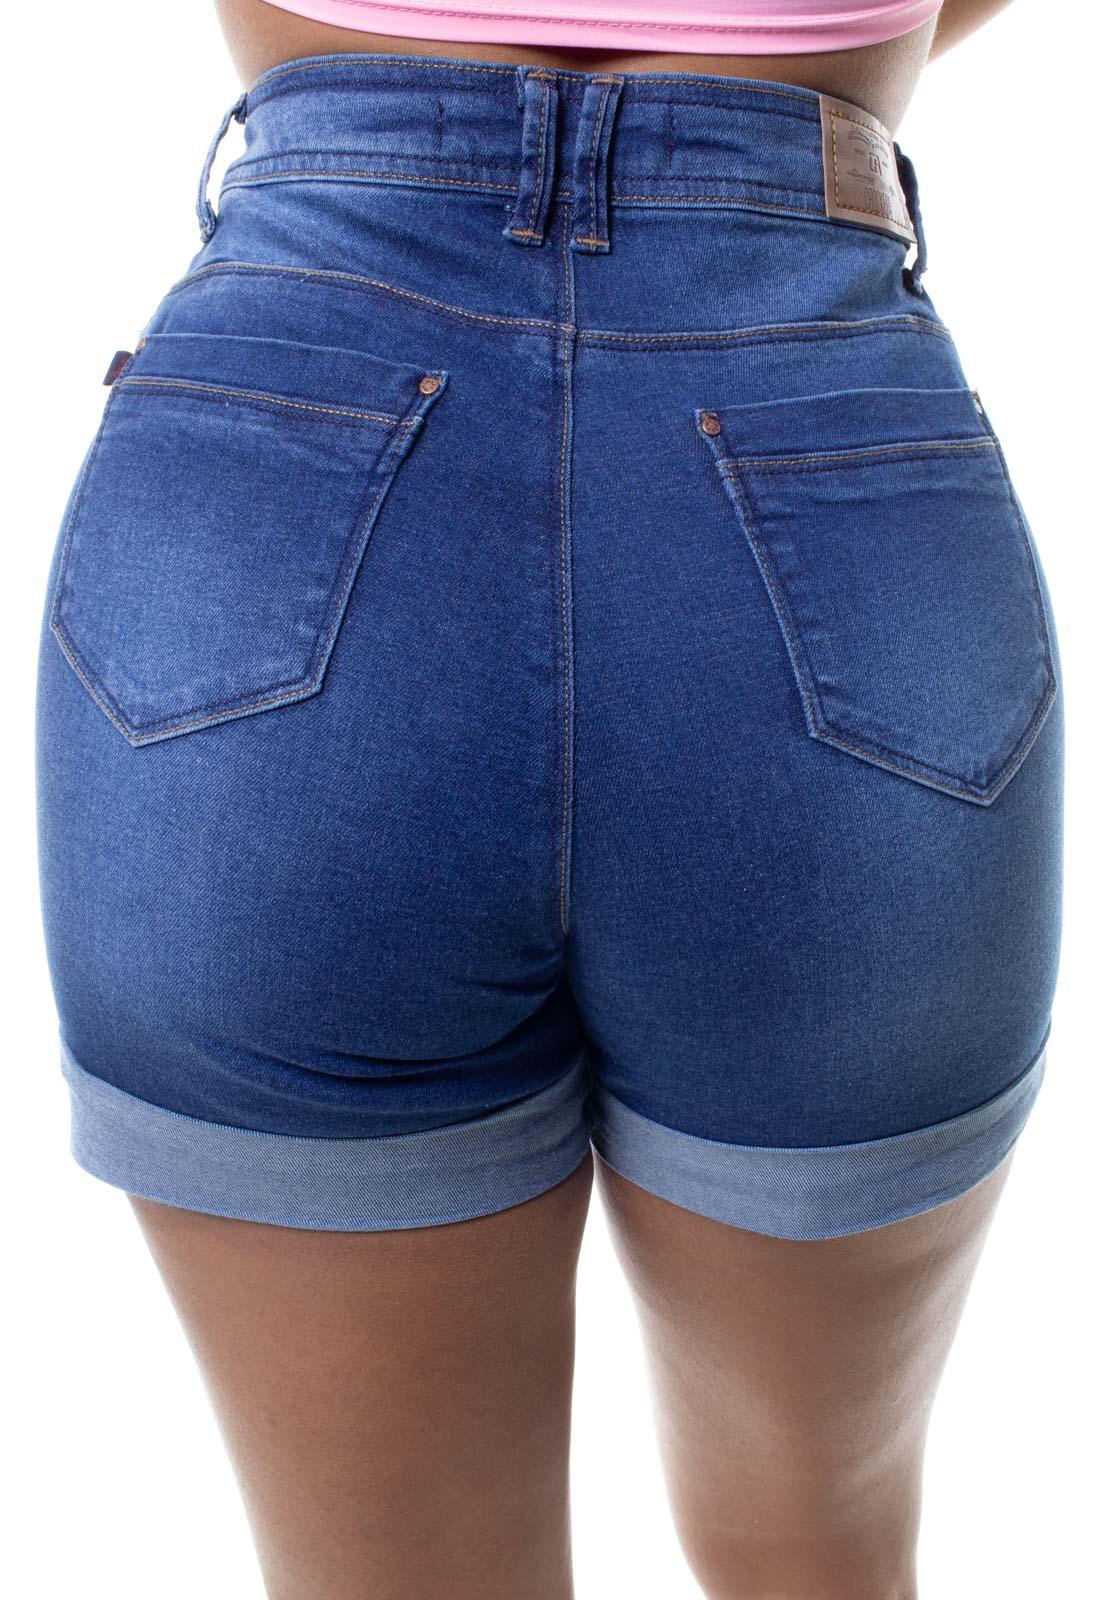 Shorts Jeans Feminino Barra Dobrada Crocker - 48300  - CROCKER JEANS